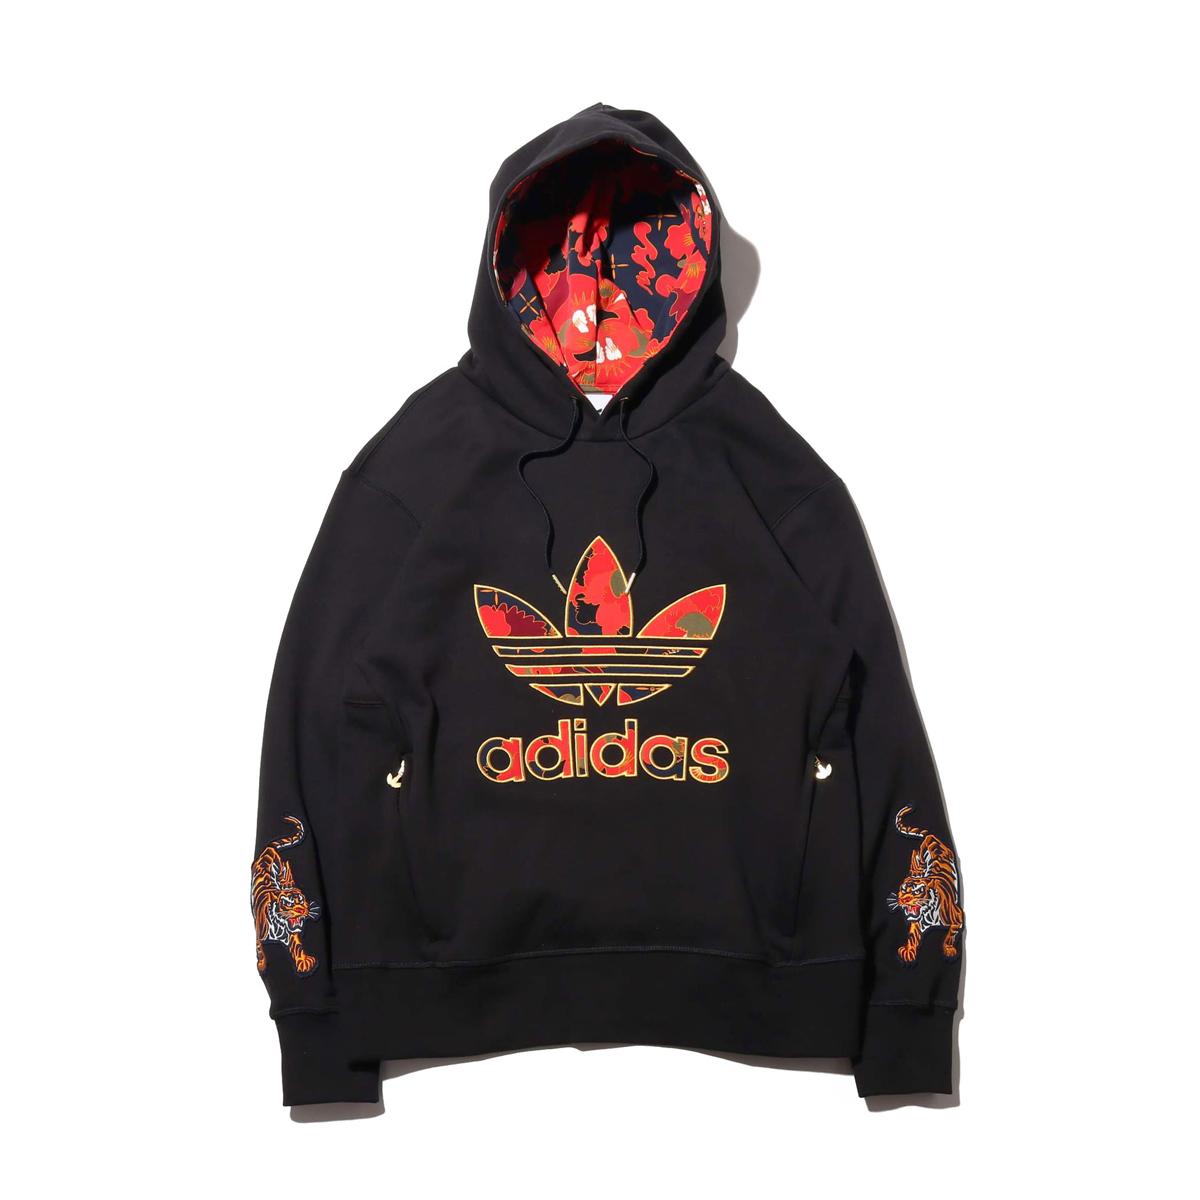 adidas HOODIE CNY(BLACK/GOLD METRIC/MULTI COLOR)(アディダス フーディー チャイニーズニューイヤー)【メンズ】【パーカー】【20SS-I】